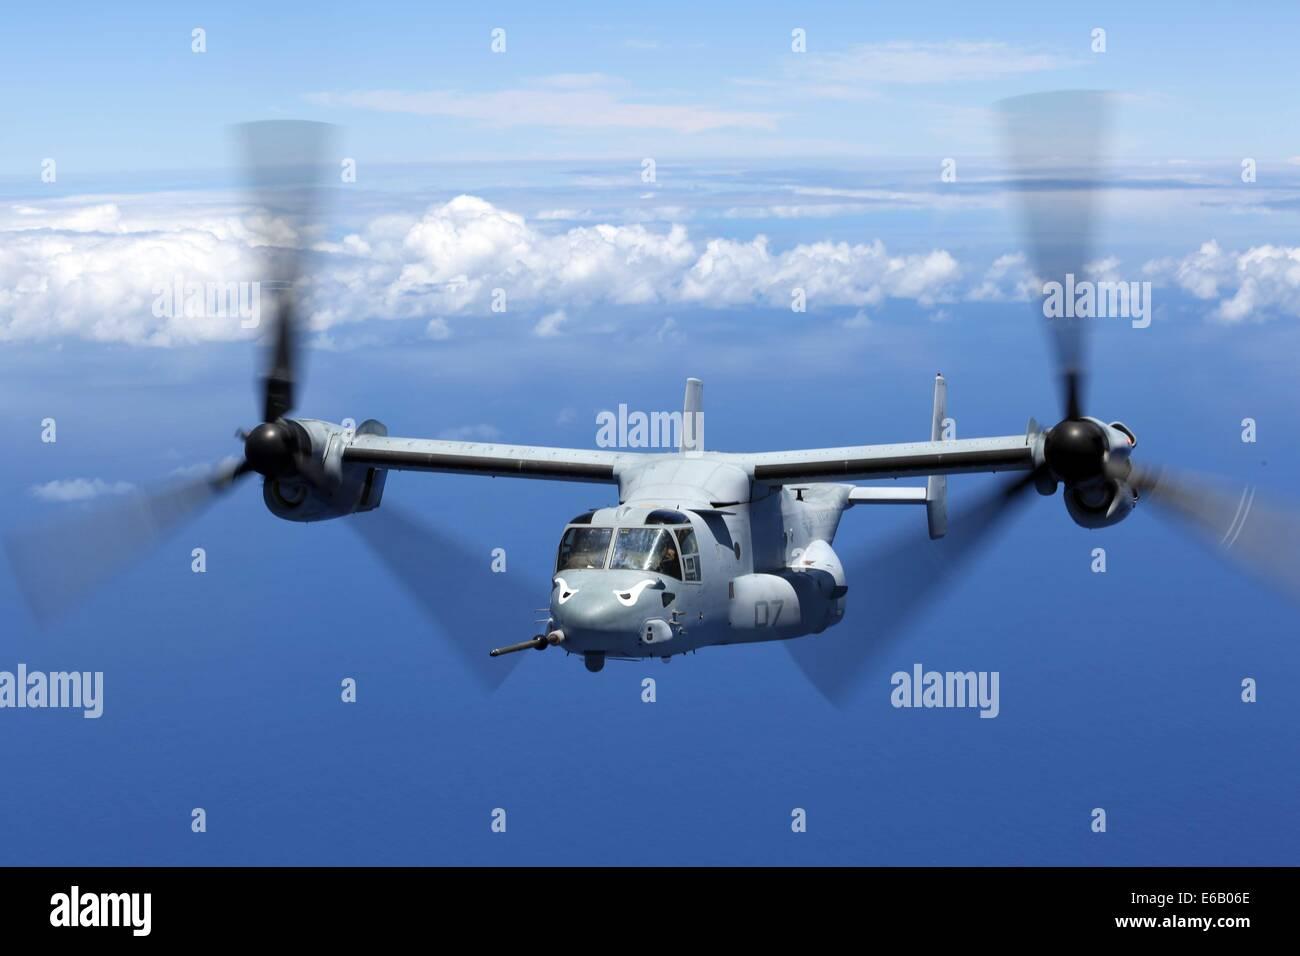 A U.S. Marine Corps MV-22B Osprey tiltrotor aircraft assigned to Marine Medium Tiltrotor Squadron (VMM) 163, 11th Stock Photo